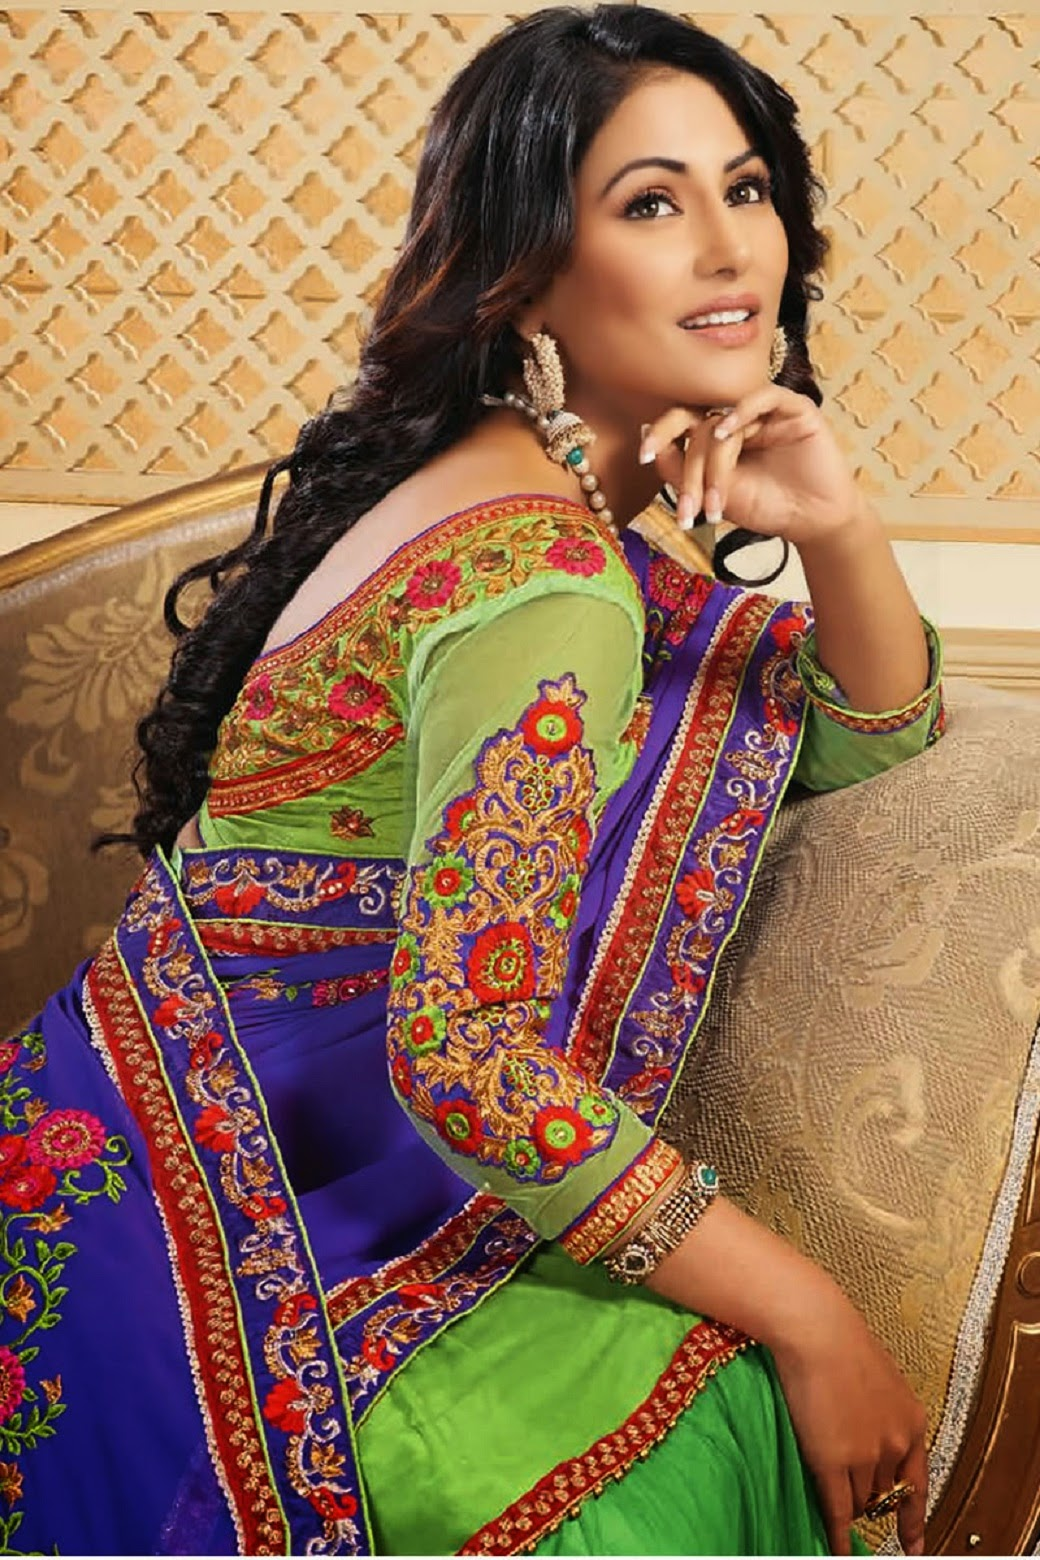 Hina Khan Wallpaper 1920x1080 62752 - Baltana